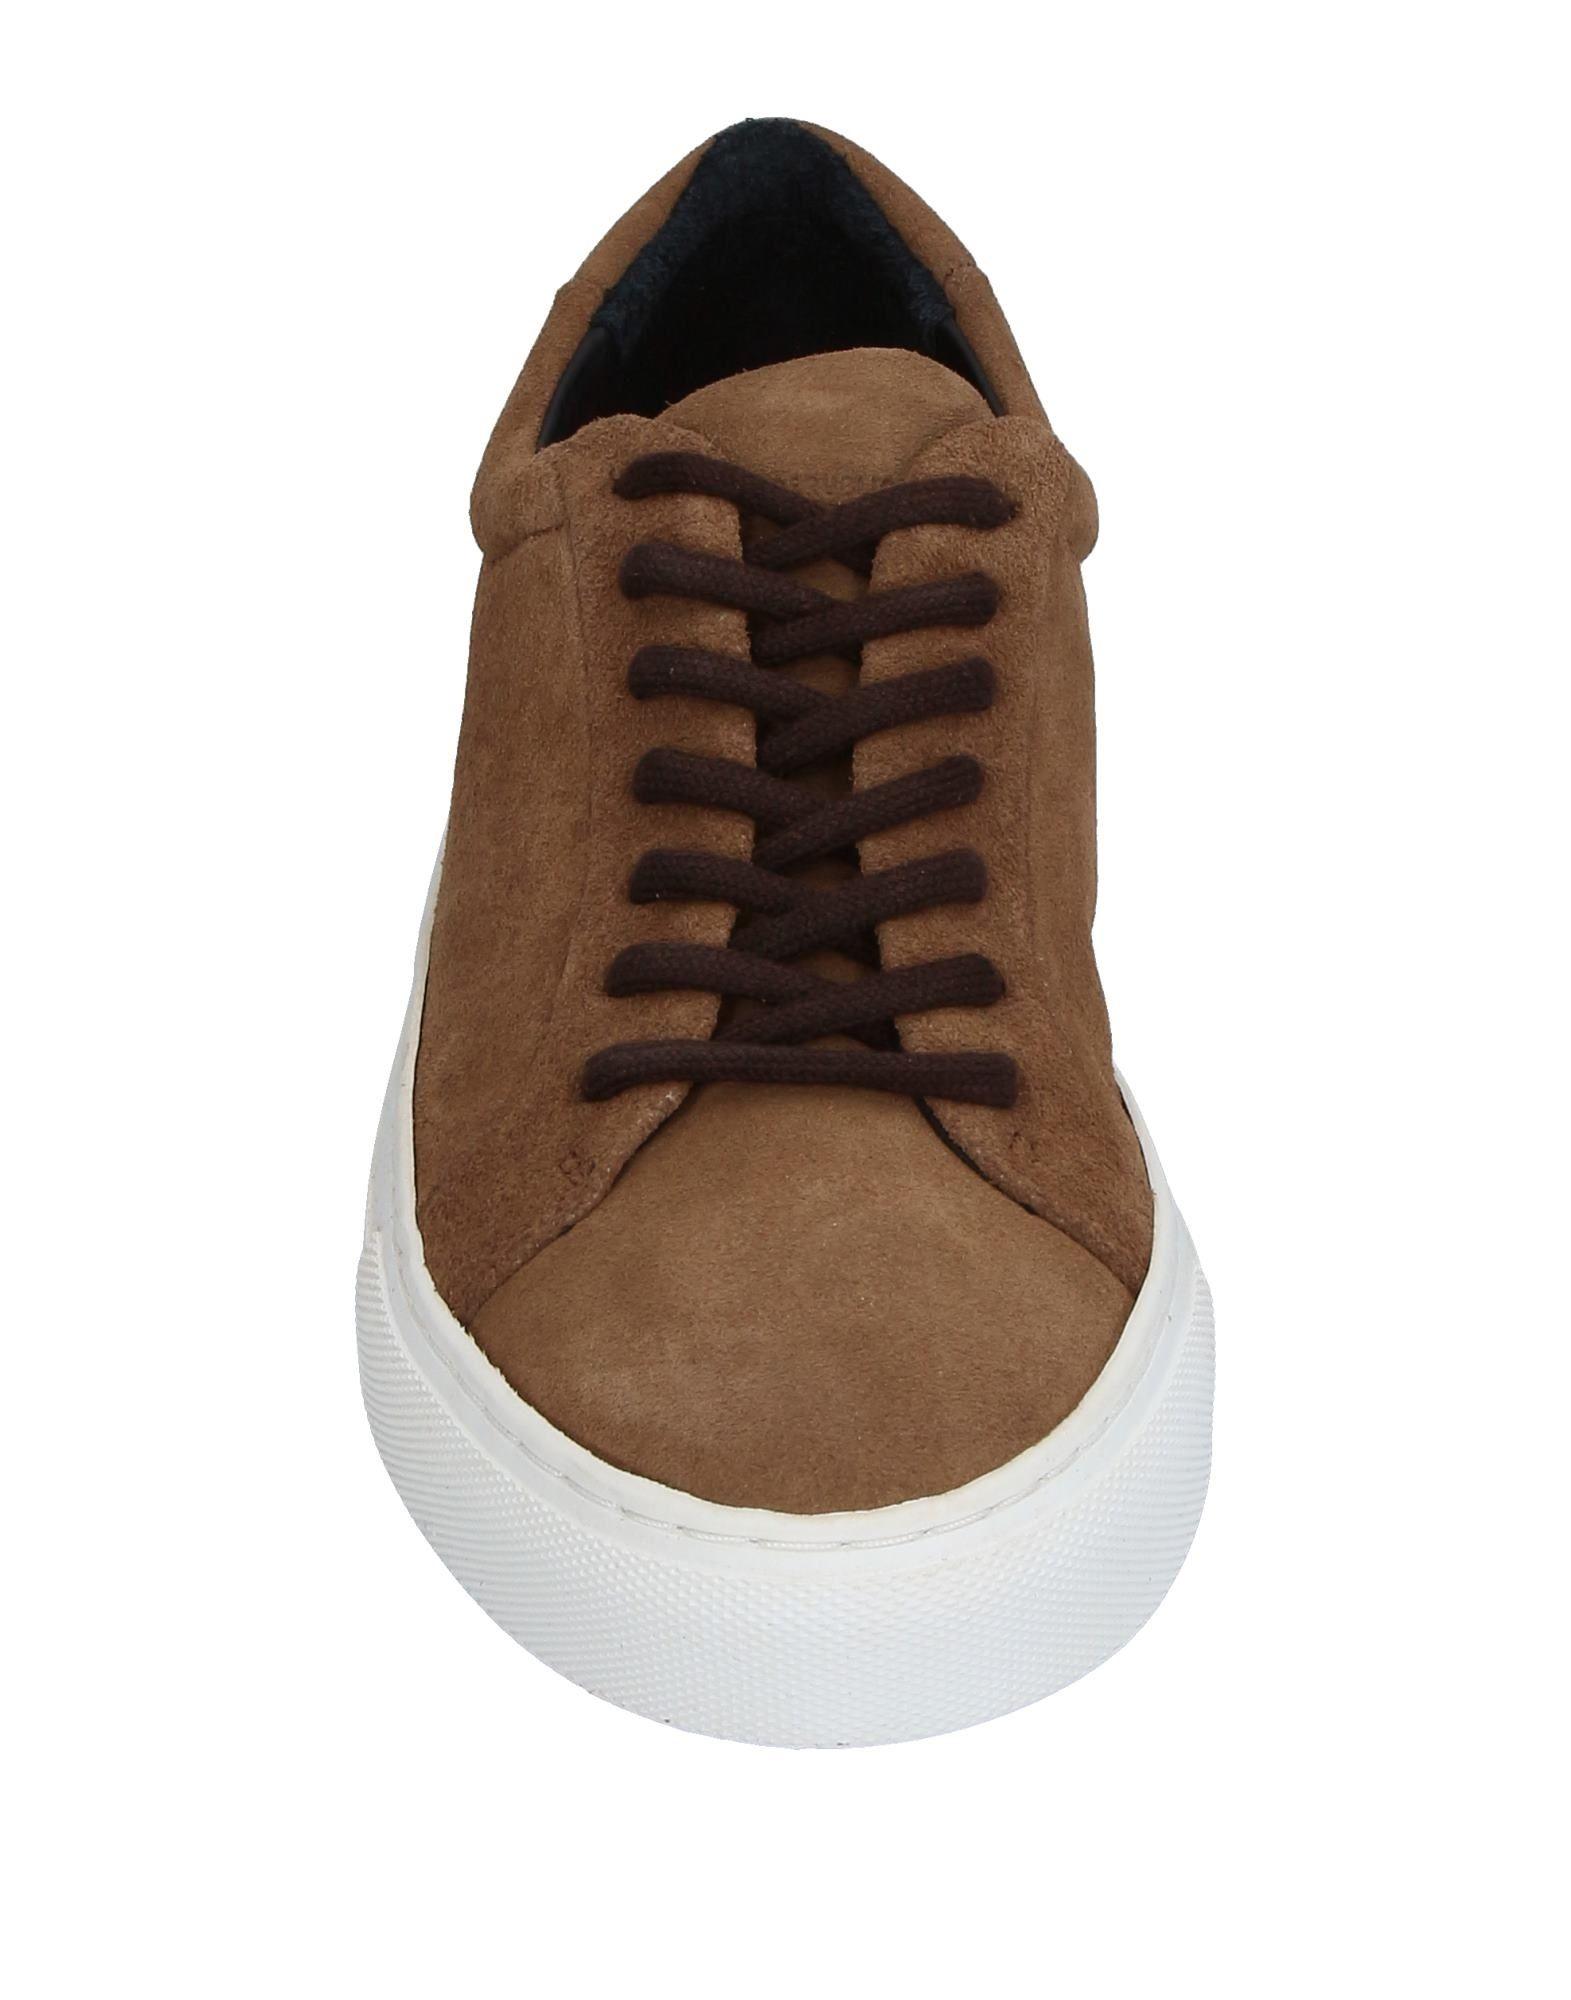 Sneakers Royal Republiq Femme - Sneakers Royal Republiq sur